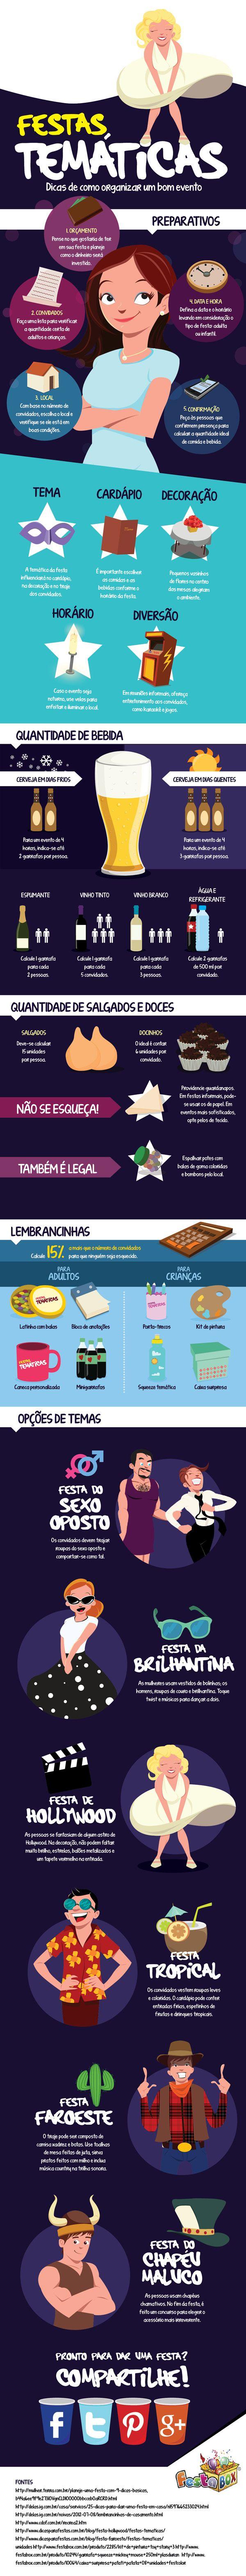 c036d119bdb7c9 Infográfico - Dicas de Festas Temáticas | Festas | Organizar festa ...